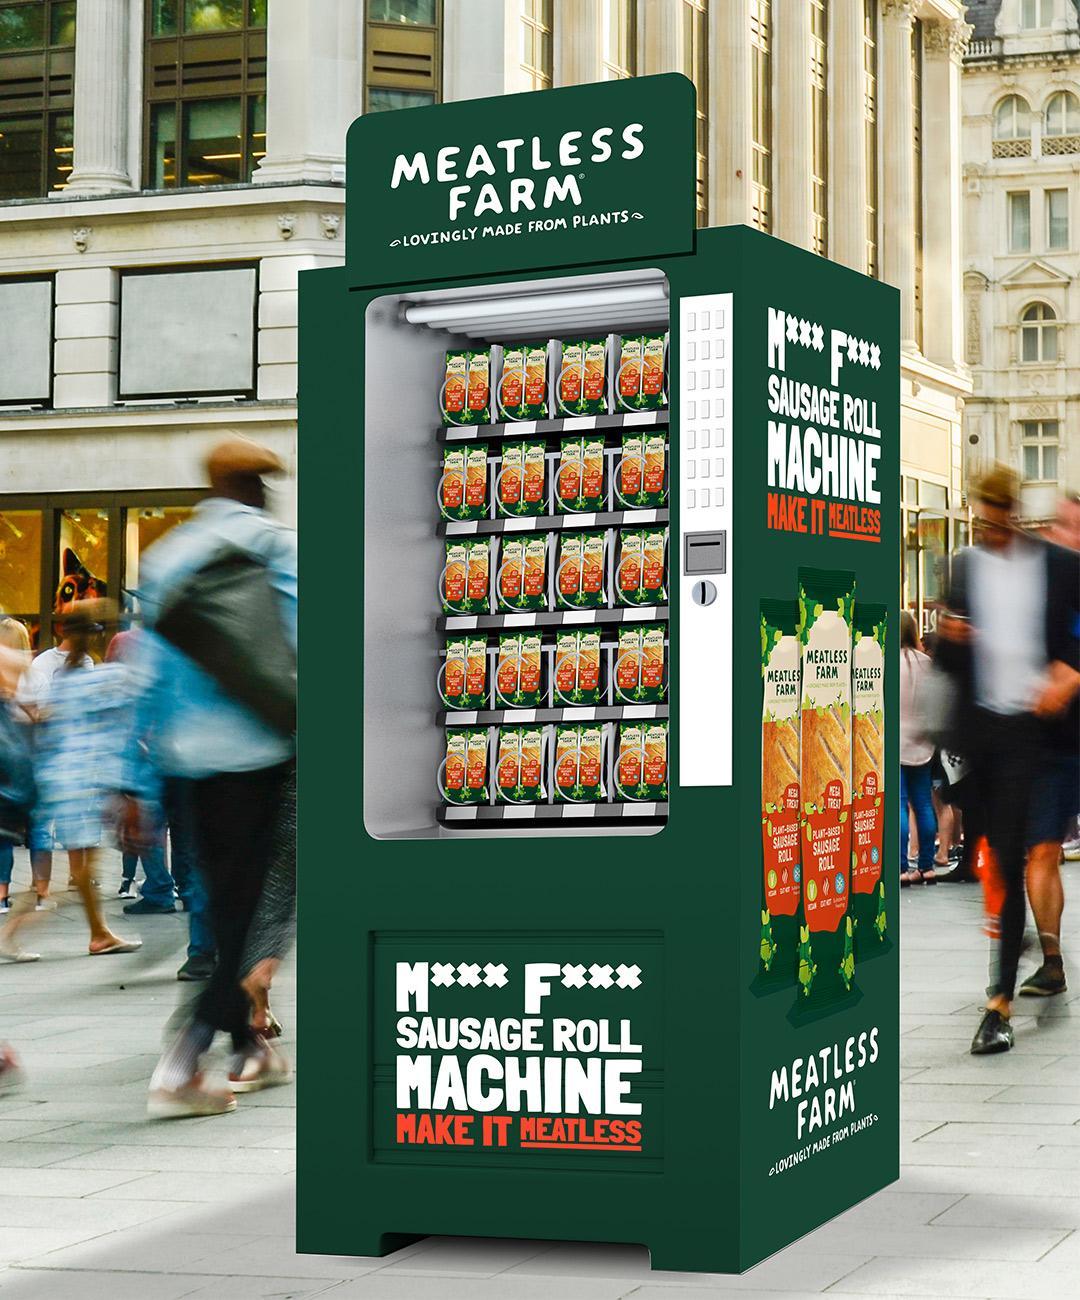 Meatless Farm Sausage Roll Vending Machine